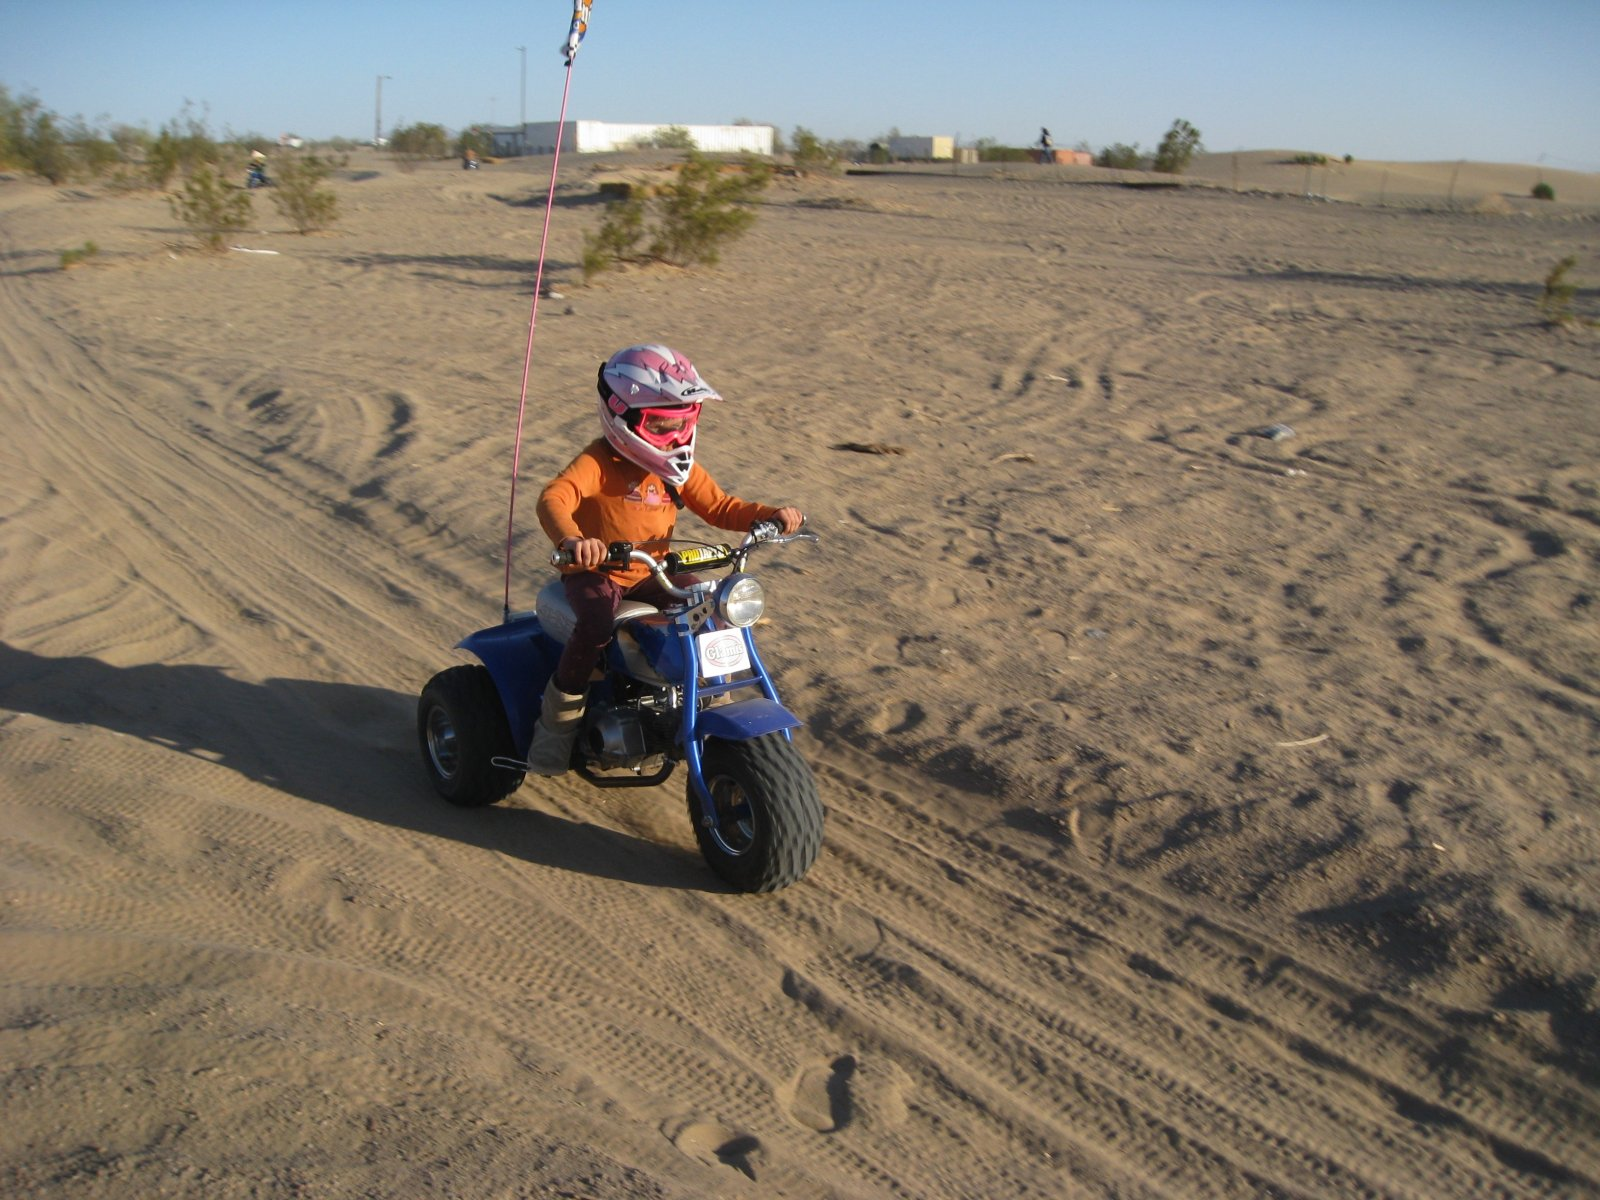 vivi riding atc 70 in pound 2009.jpg